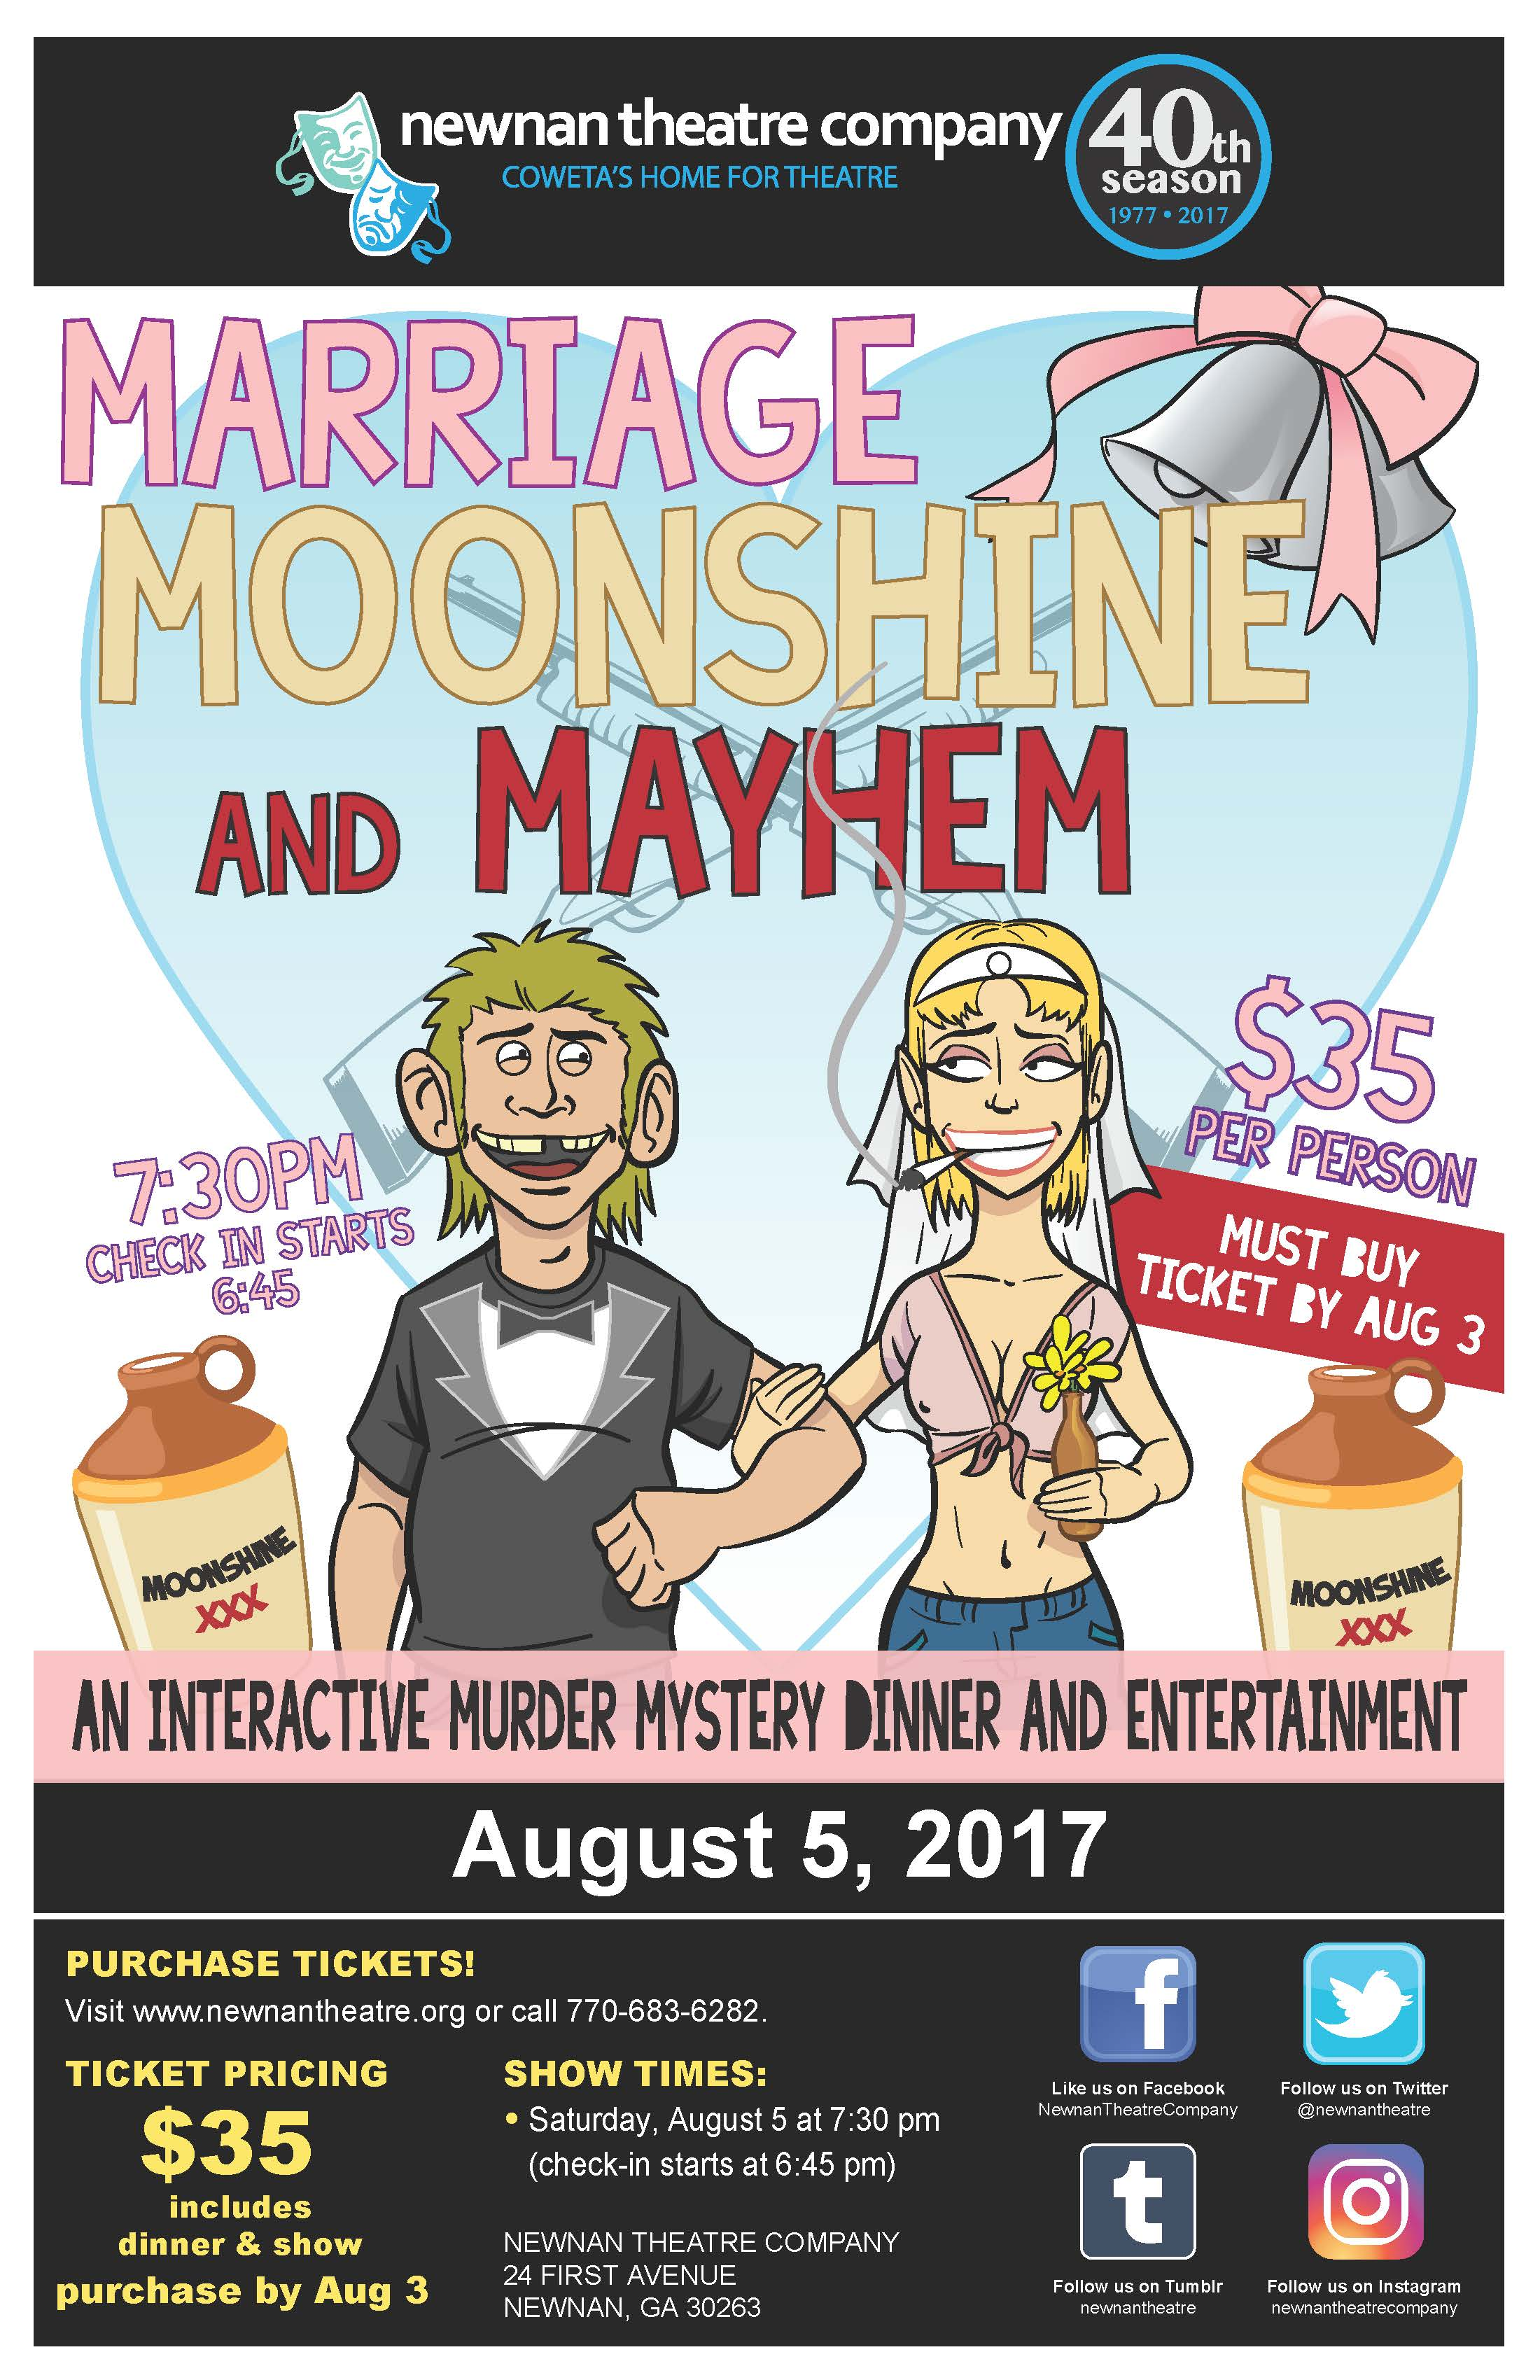 Redneck murder mystery poster 11x17.jpg